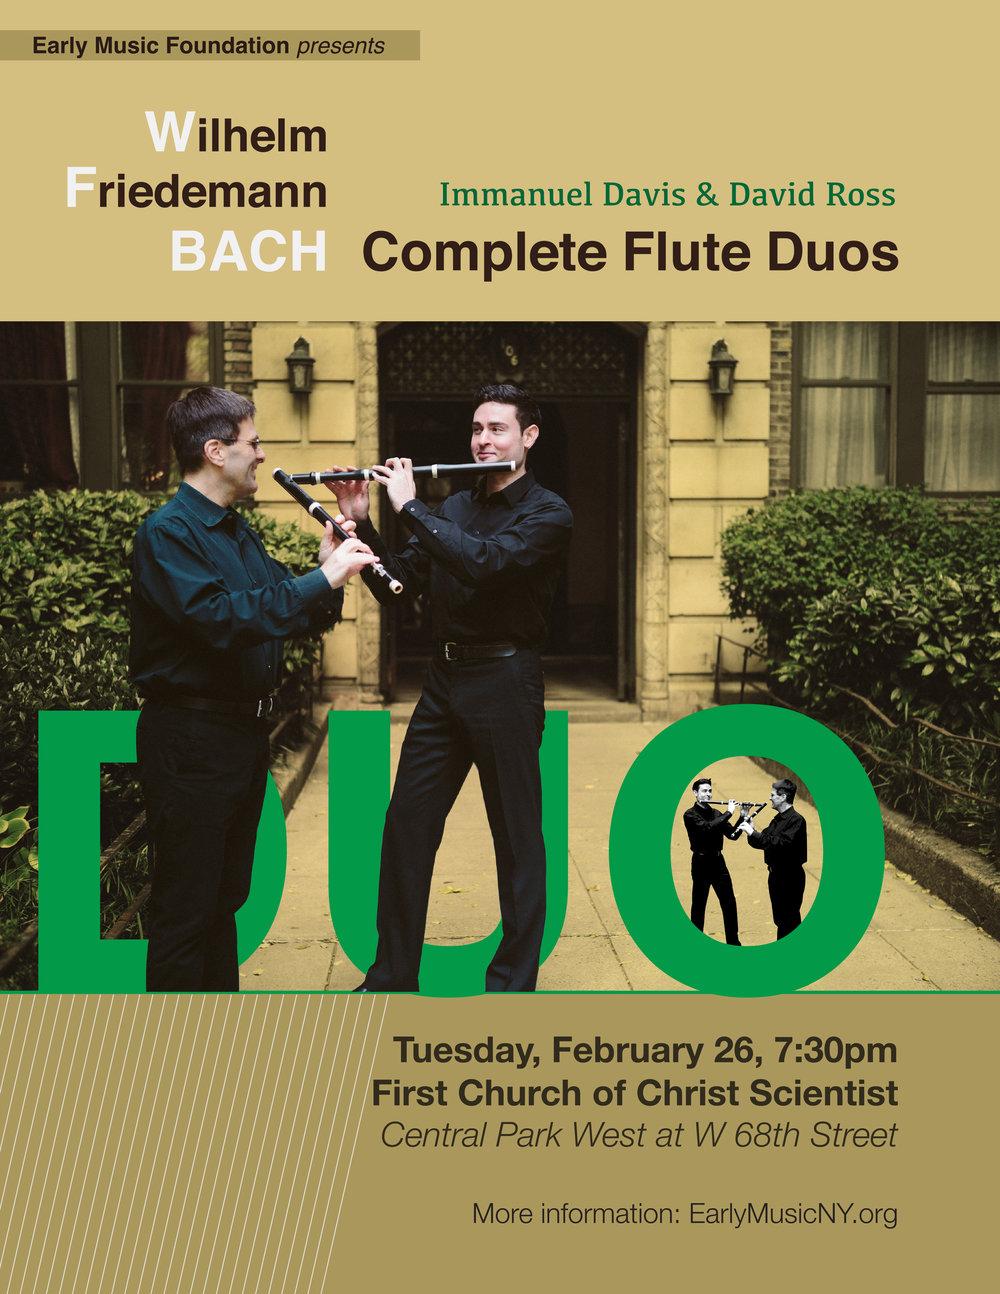 Wilhelm Friedmann Bach - Complete Flute Duos